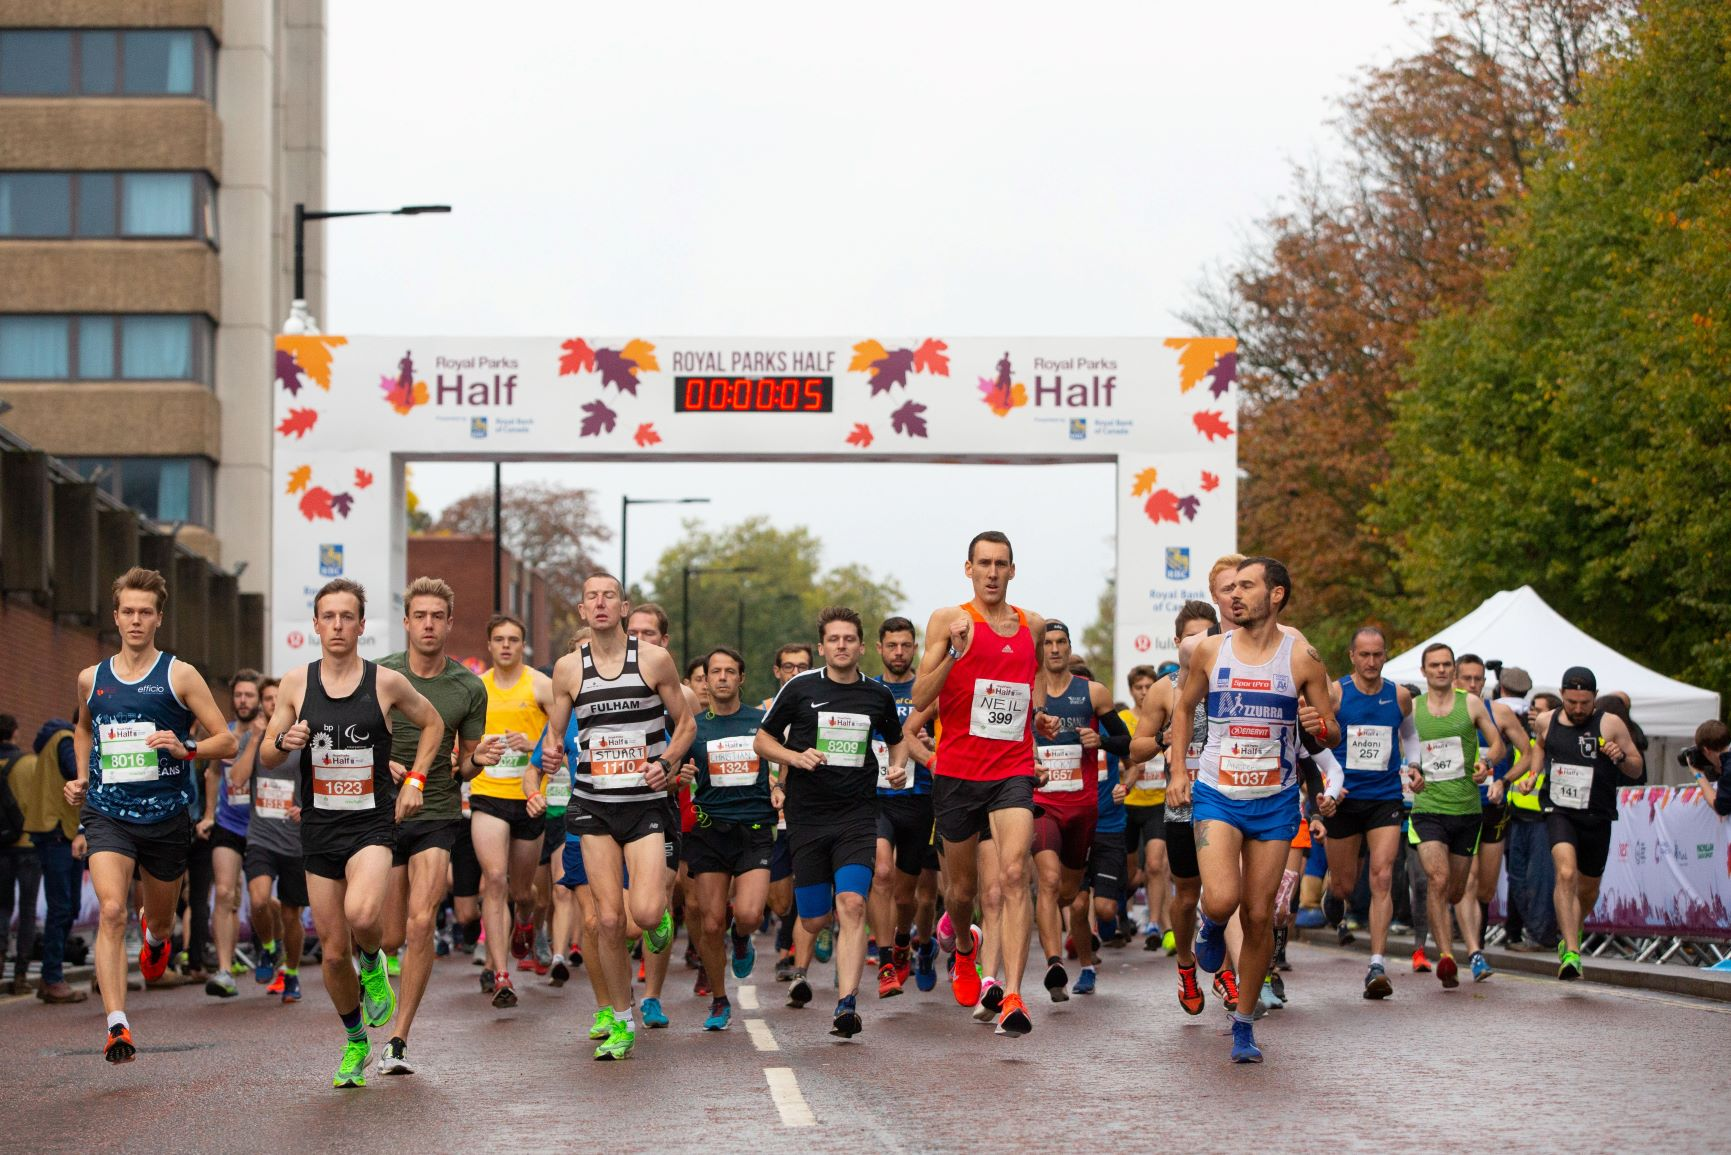 Royal Parks Half Marathon Start Line